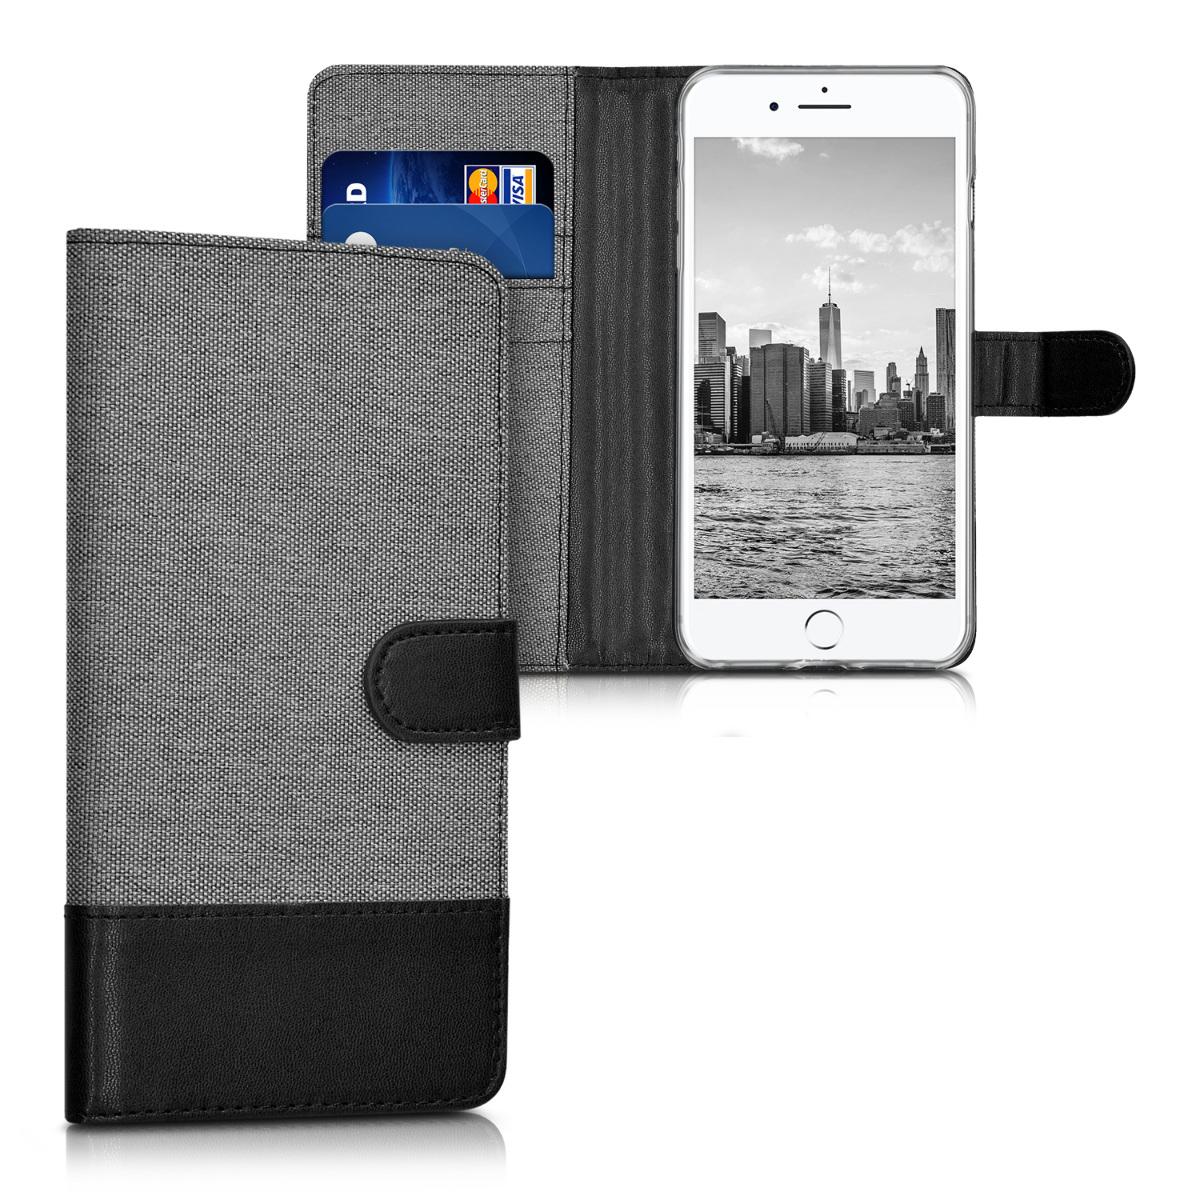 KW Θήκη Πορτοφόλι iPhone 7 Plus / 8 Plus - Grey / Black Canvas (39496.22)